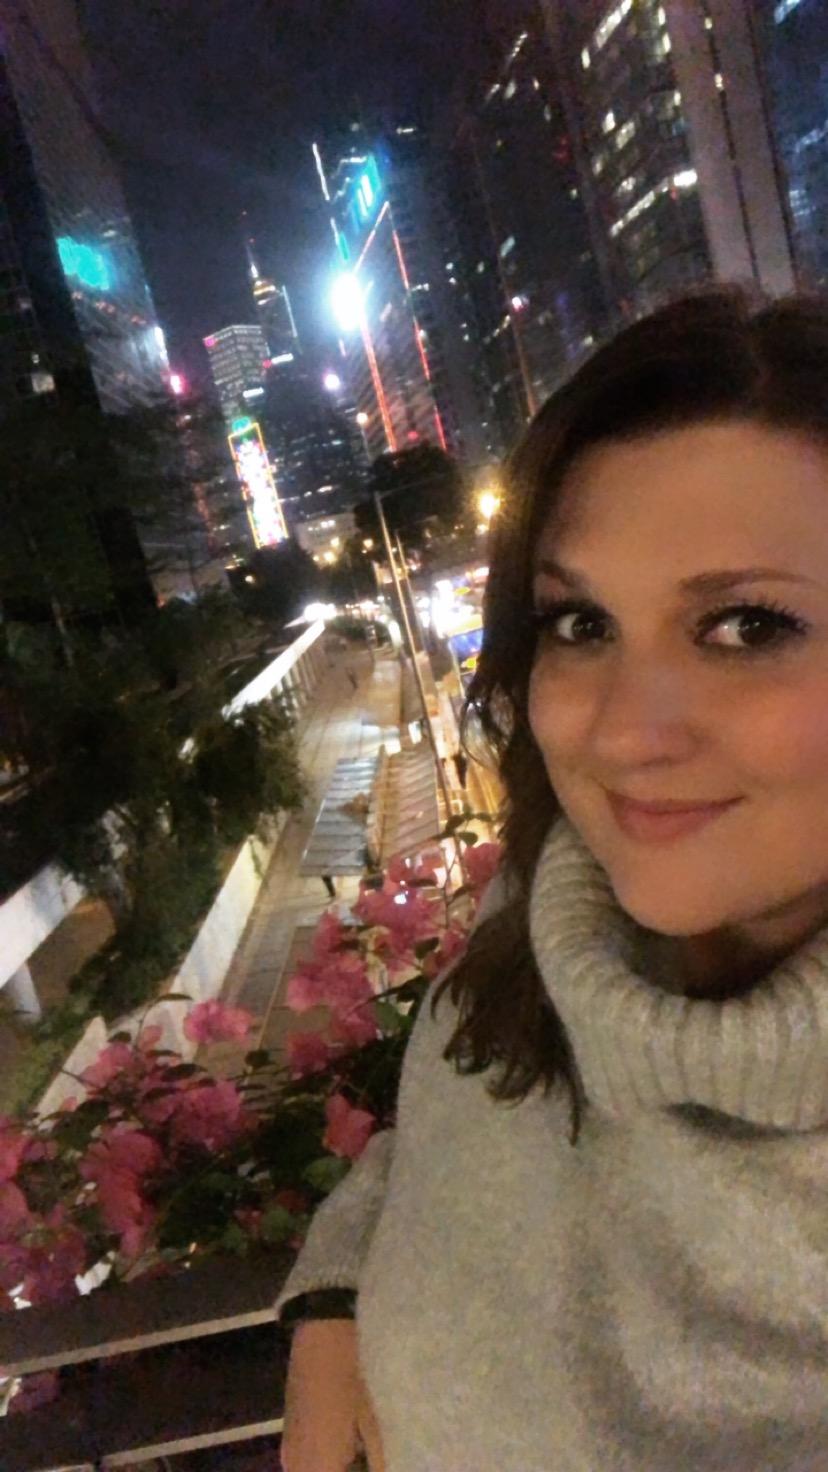 AISC 2018 & my adventures in Hong Kong … - Love To Teach